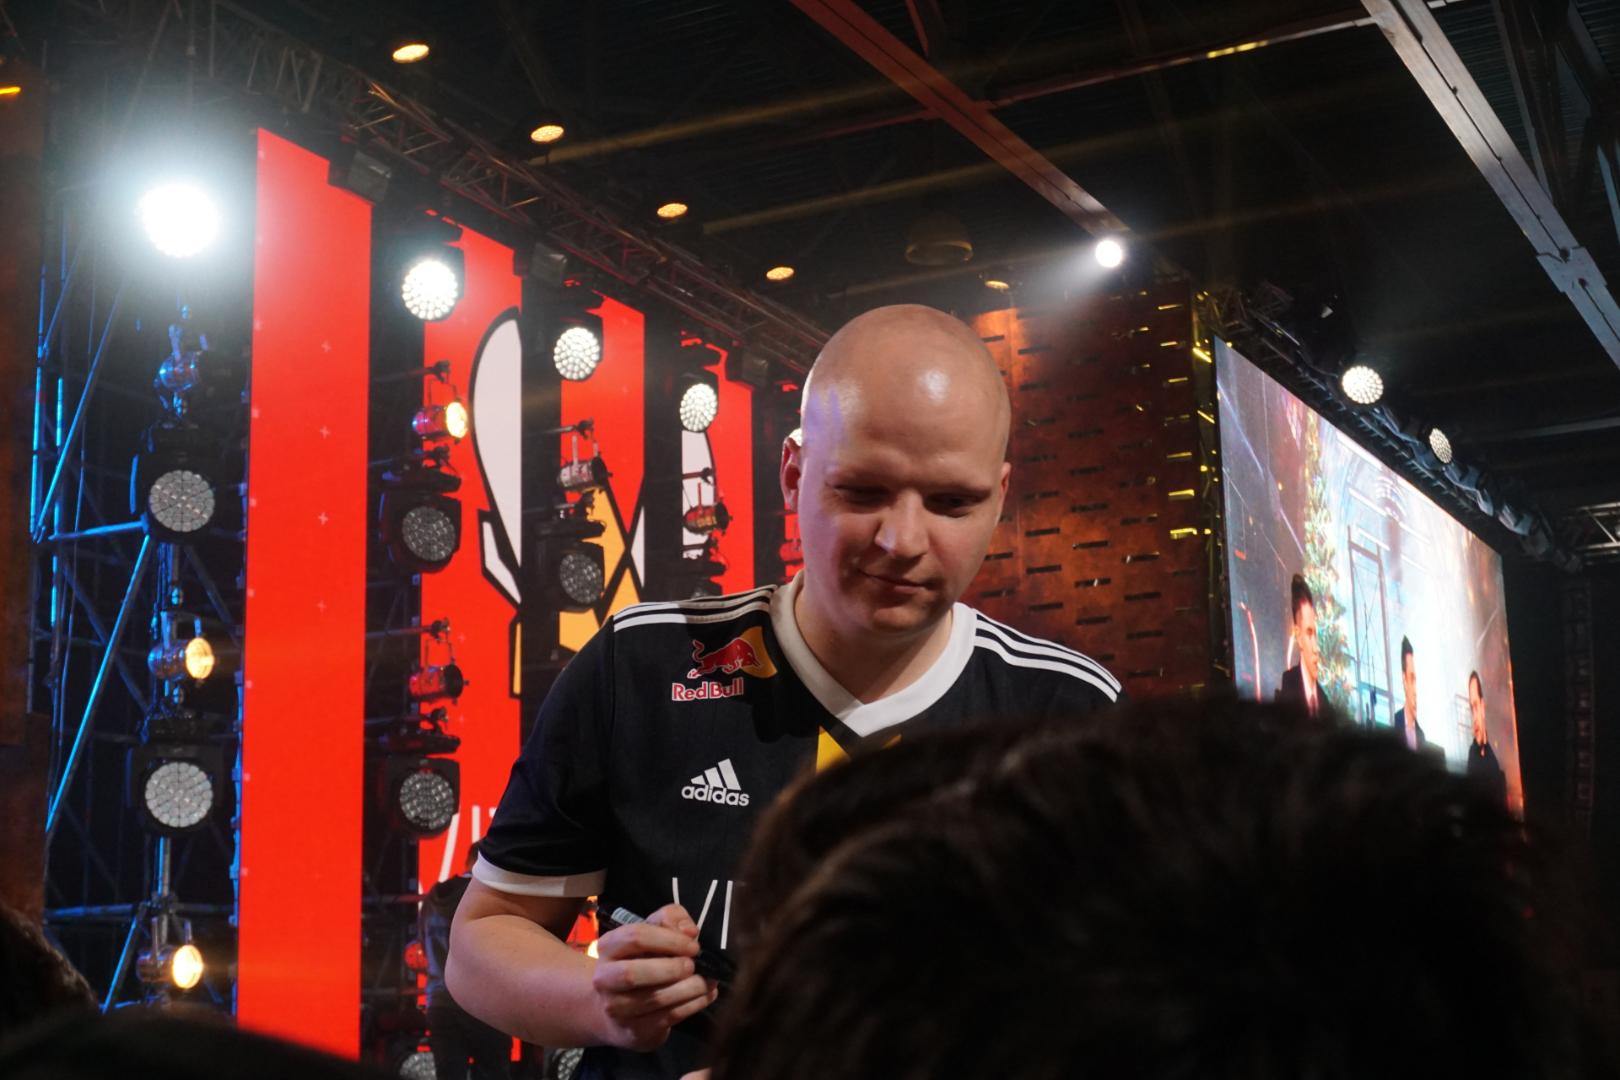 Тренер команды Vitality, Реми Конем, раздаёт автографы